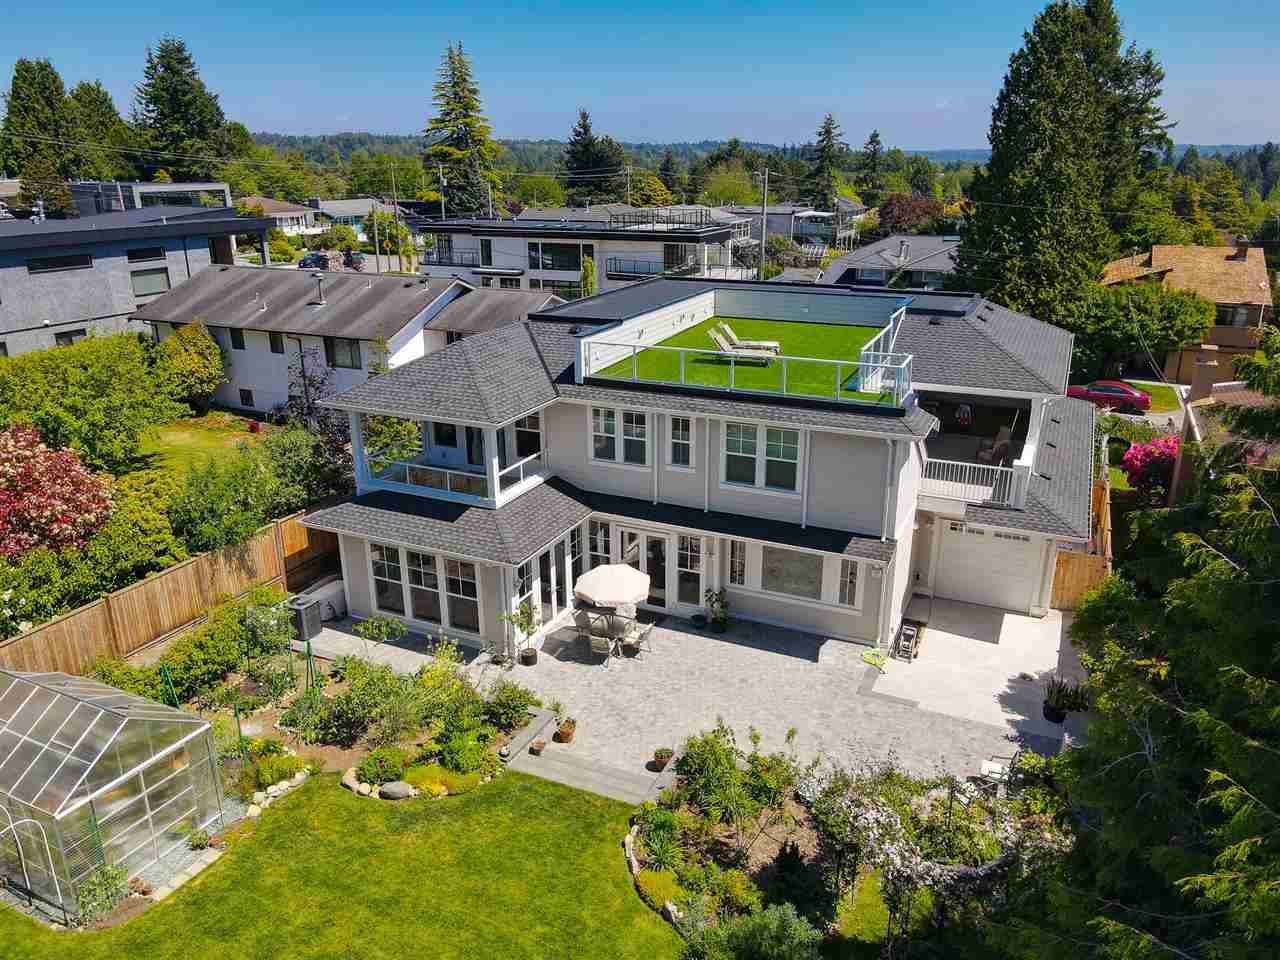 Main Photo: 1165 STEVENS Street: White Rock House for sale (South Surrey White Rock)  : MLS®# R2588269